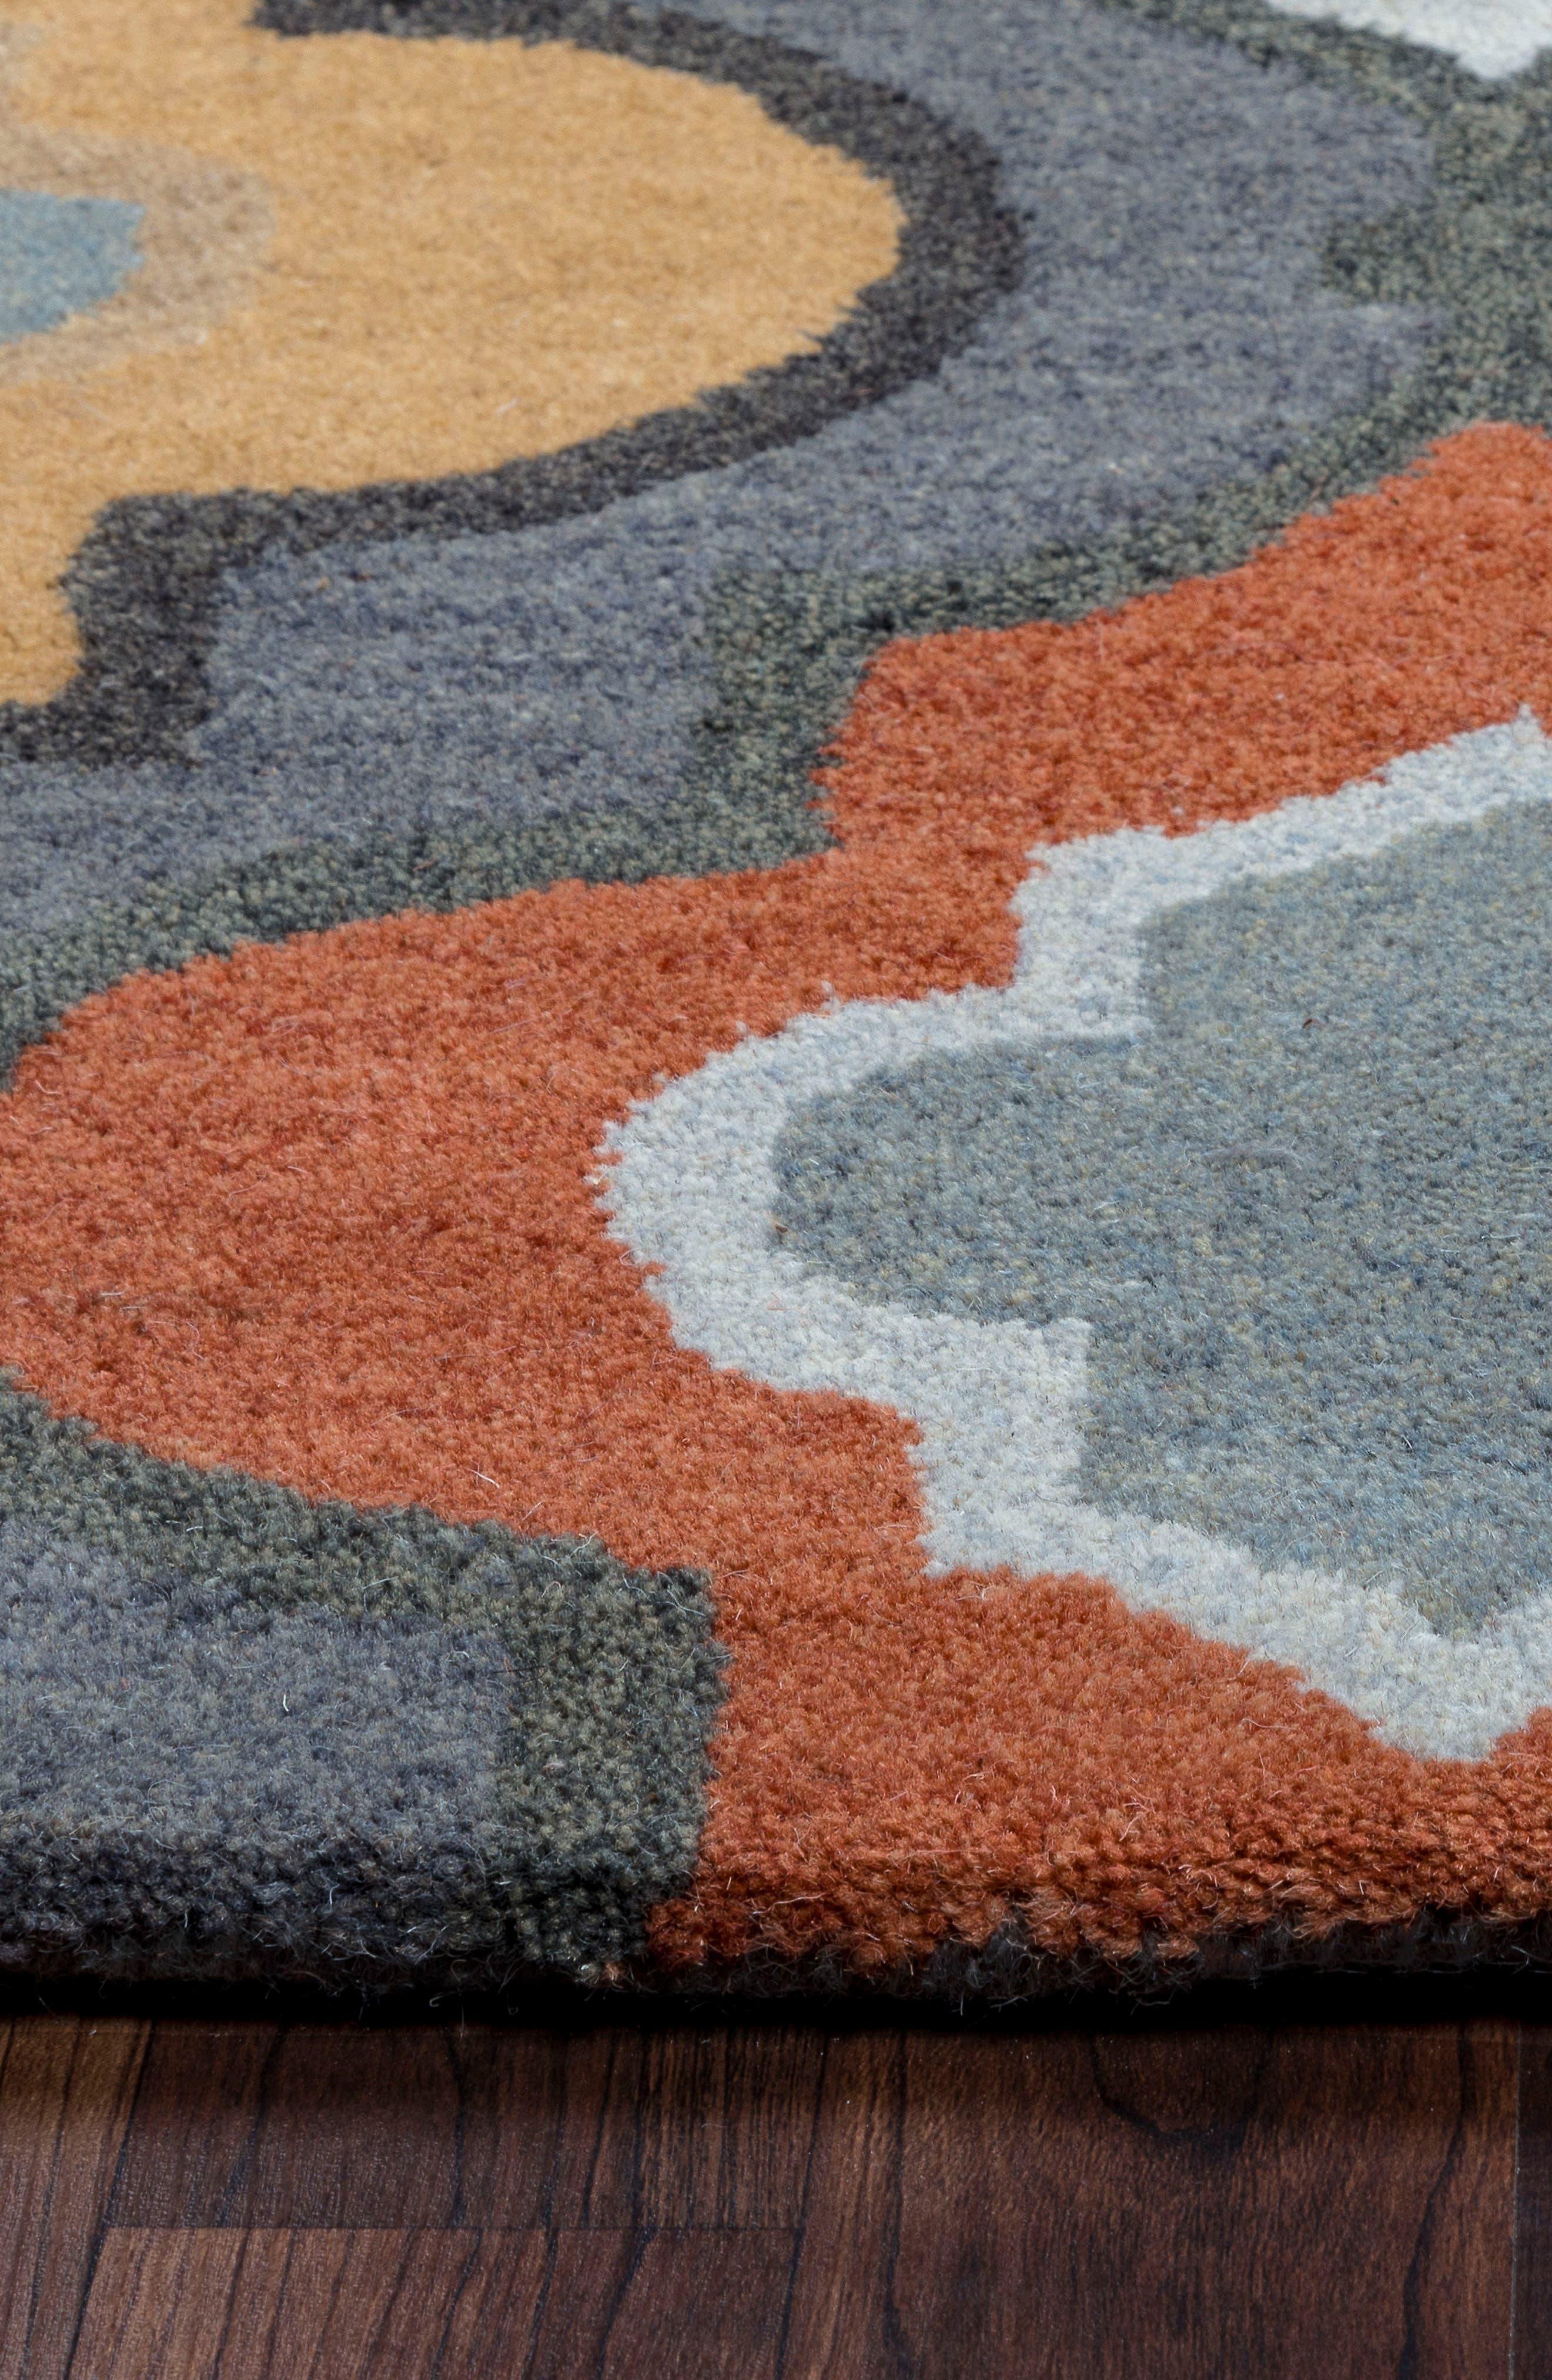 'Quatrefoil' Hand Tufted Wool Area Rug,                             Alternate thumbnail 4, color,                             030